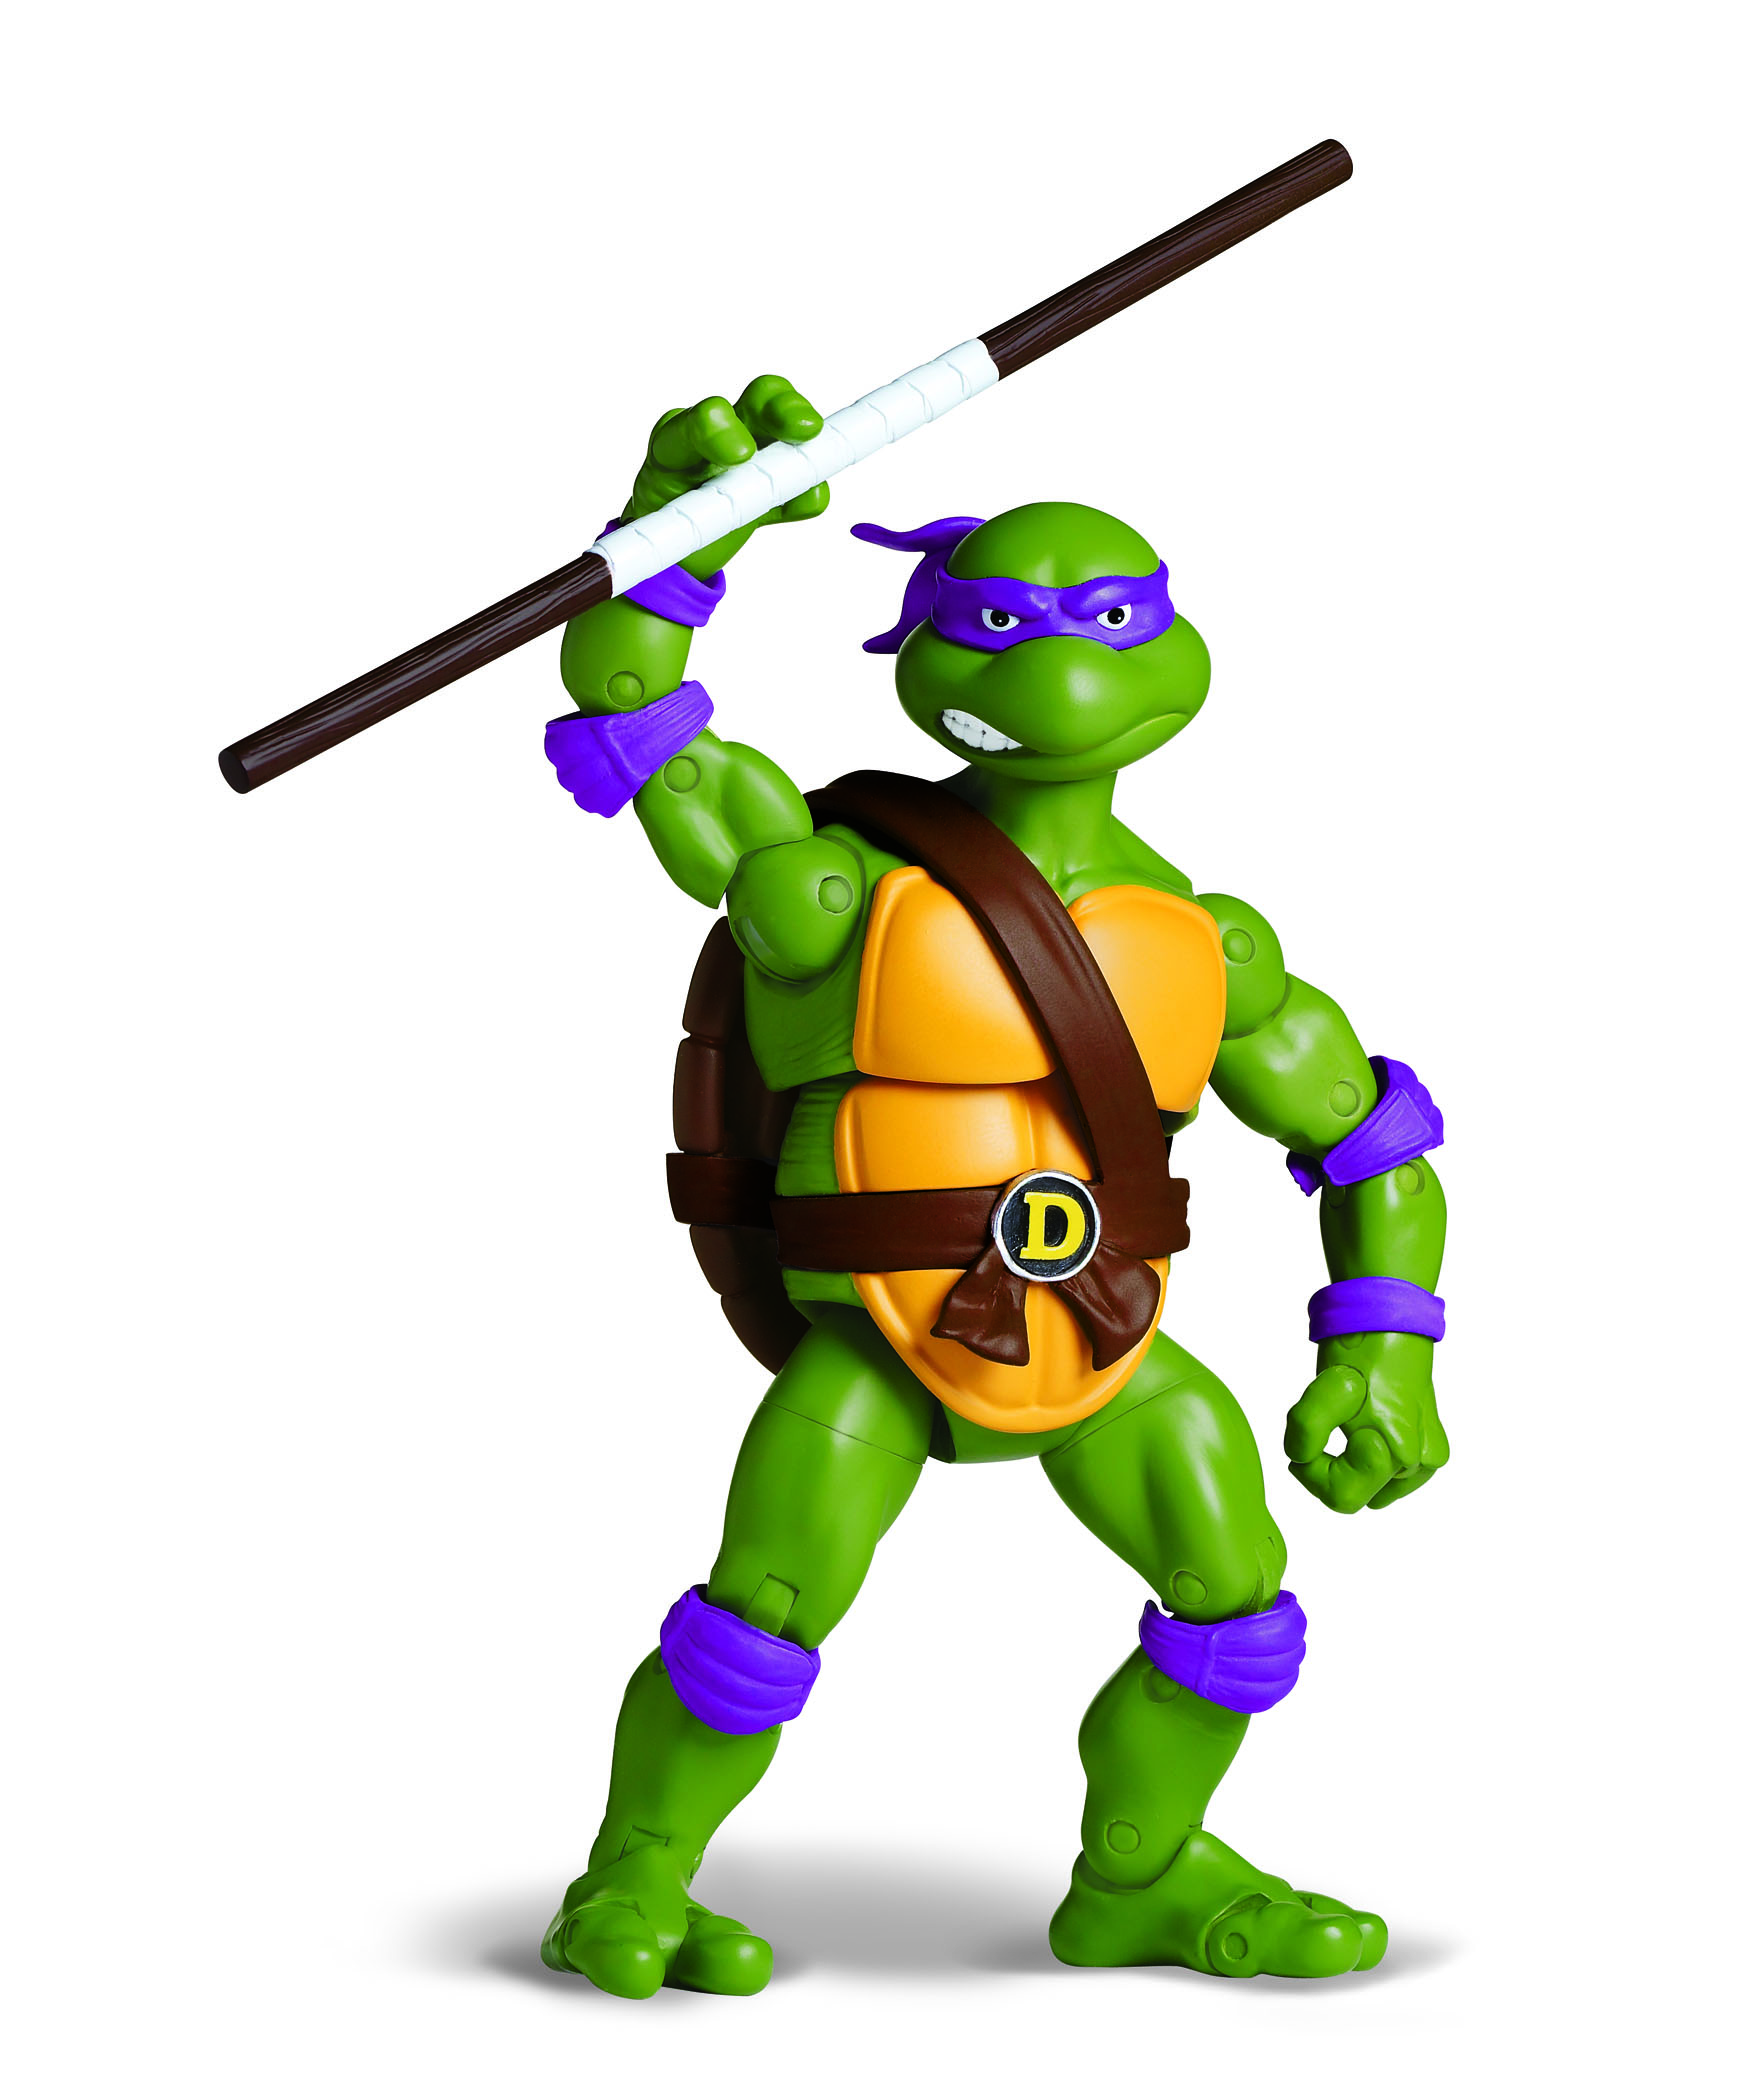 Ninja Turtles clipart cartoon Clip Clipartion Ninja #8840 Turtle